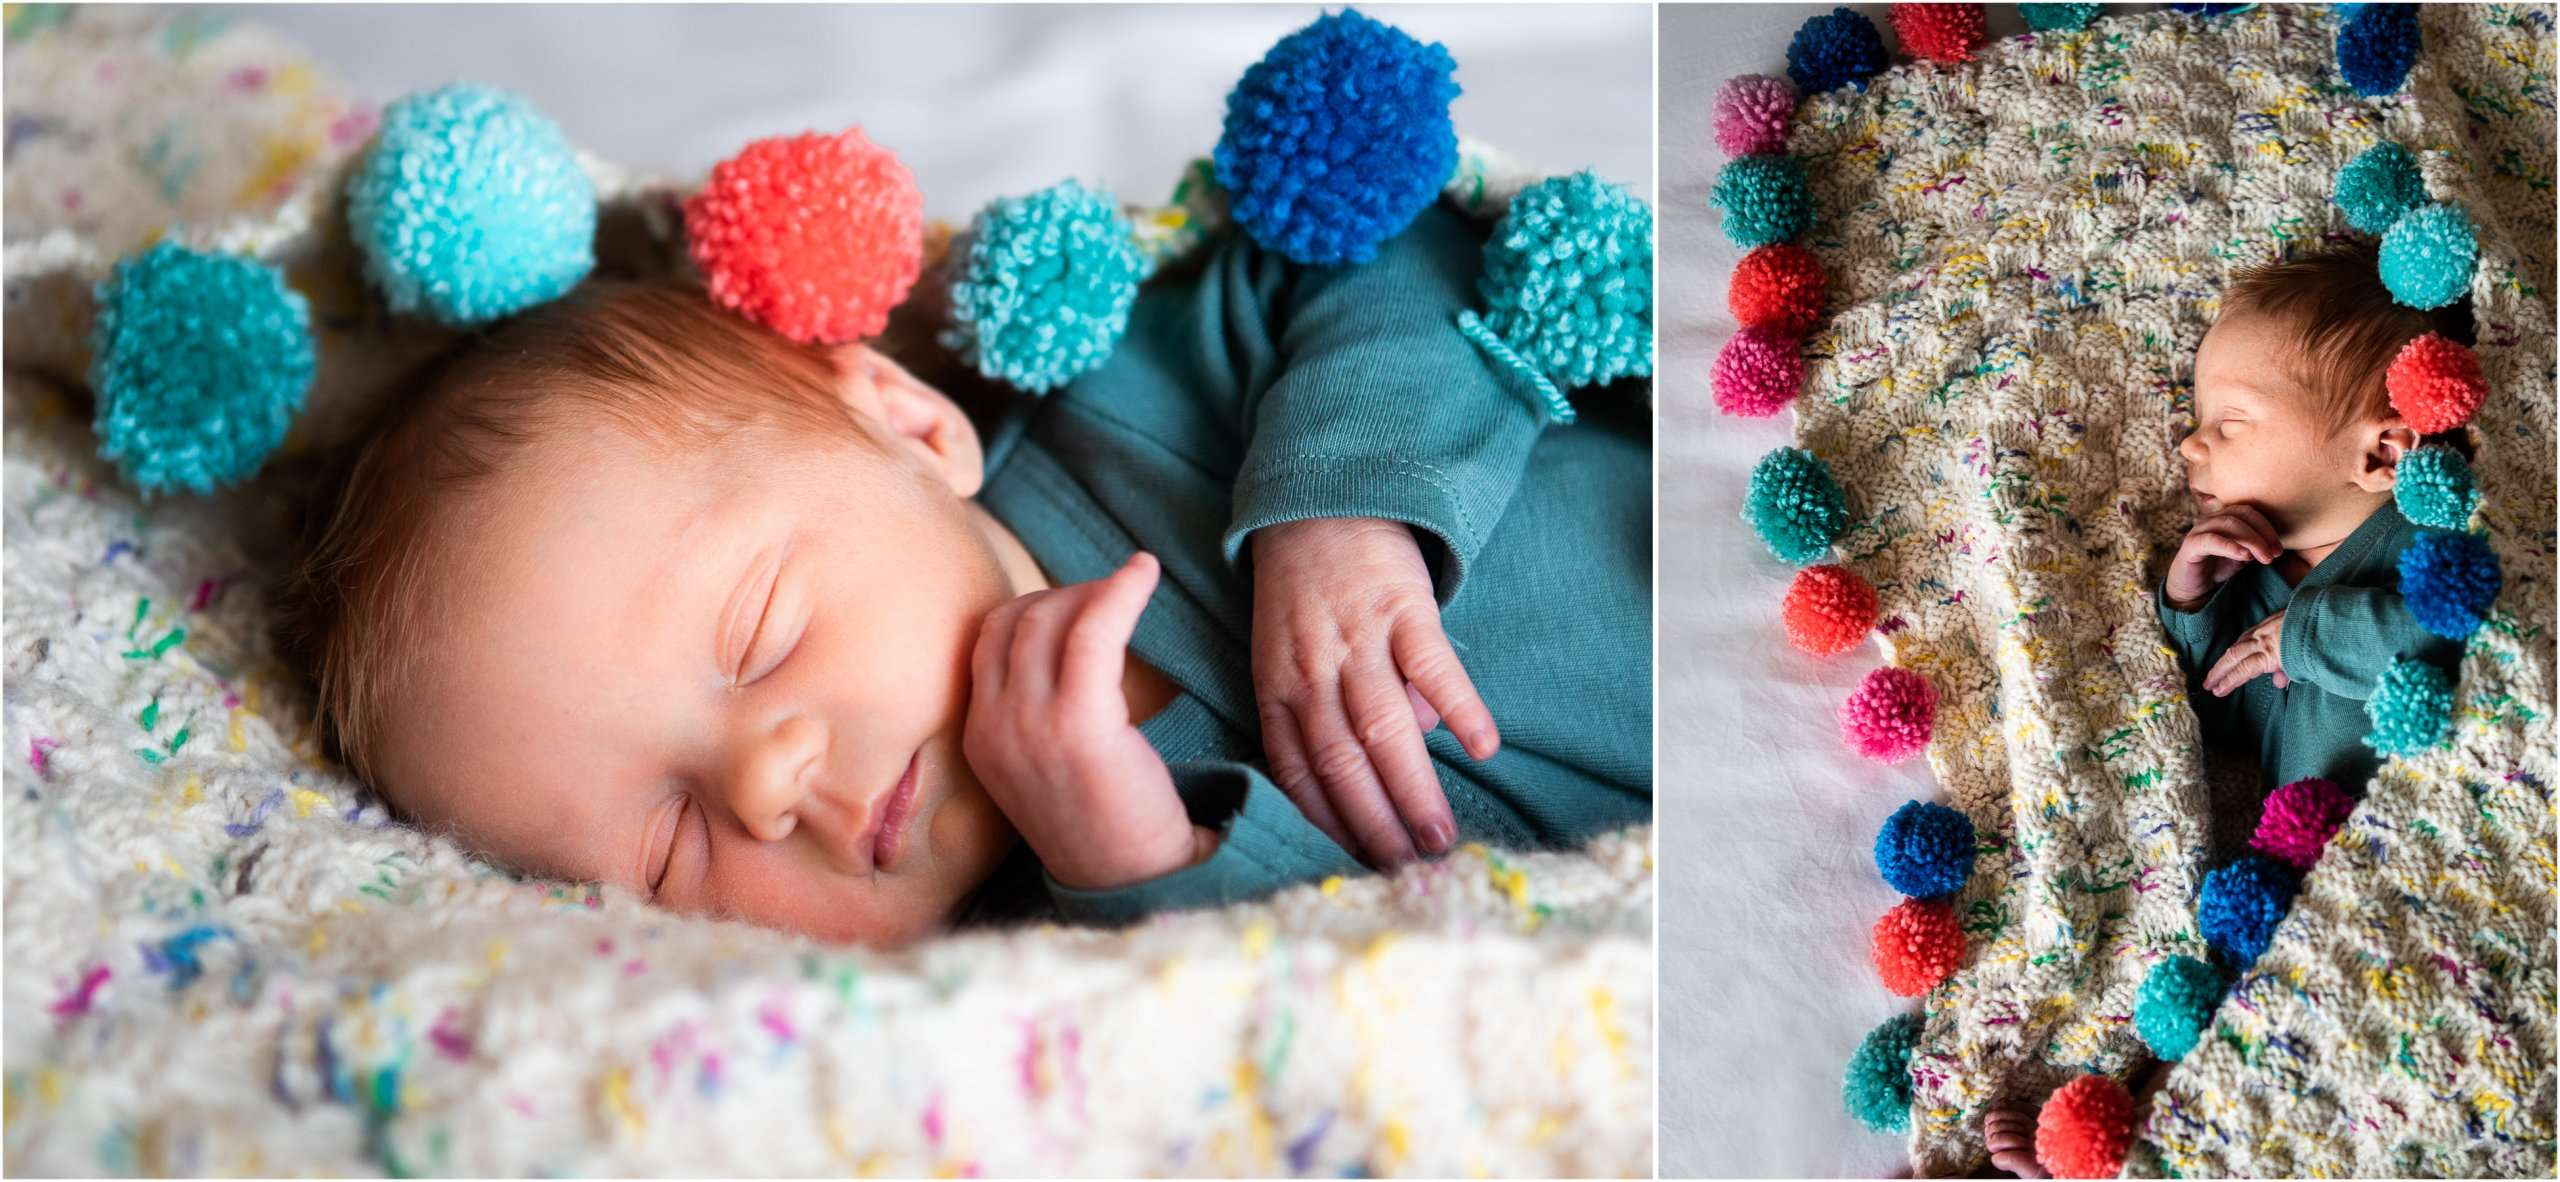 Two portrait photos taken at home of a newborn baby asleep in a pom pom blanket, taken in Chichester, Sussex